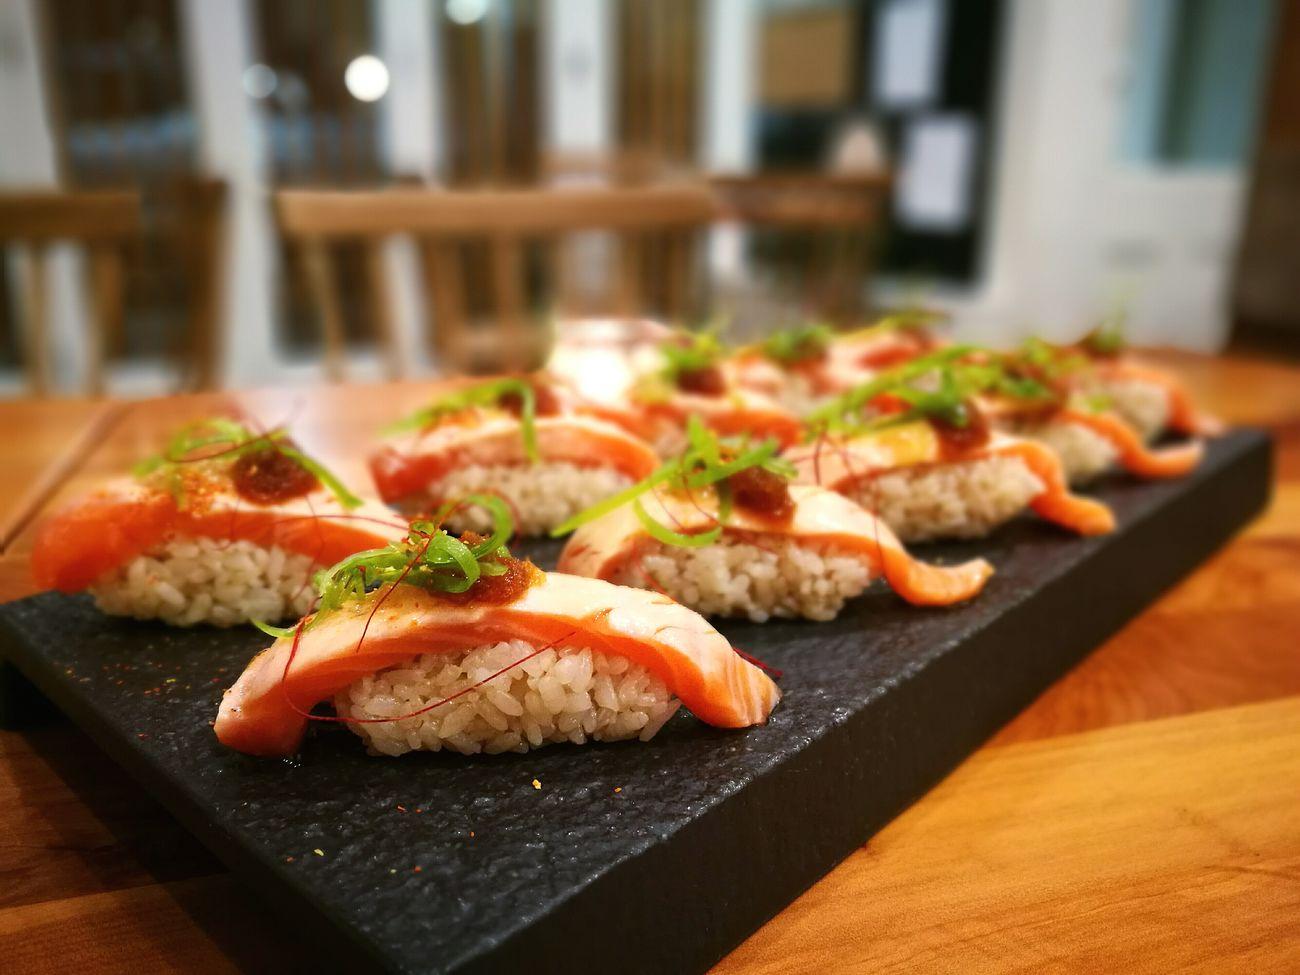 Melting Moment Salmon Food Sushi Nigiri Salmon Nigiri Tasty Japanese Food SuparGusCollection